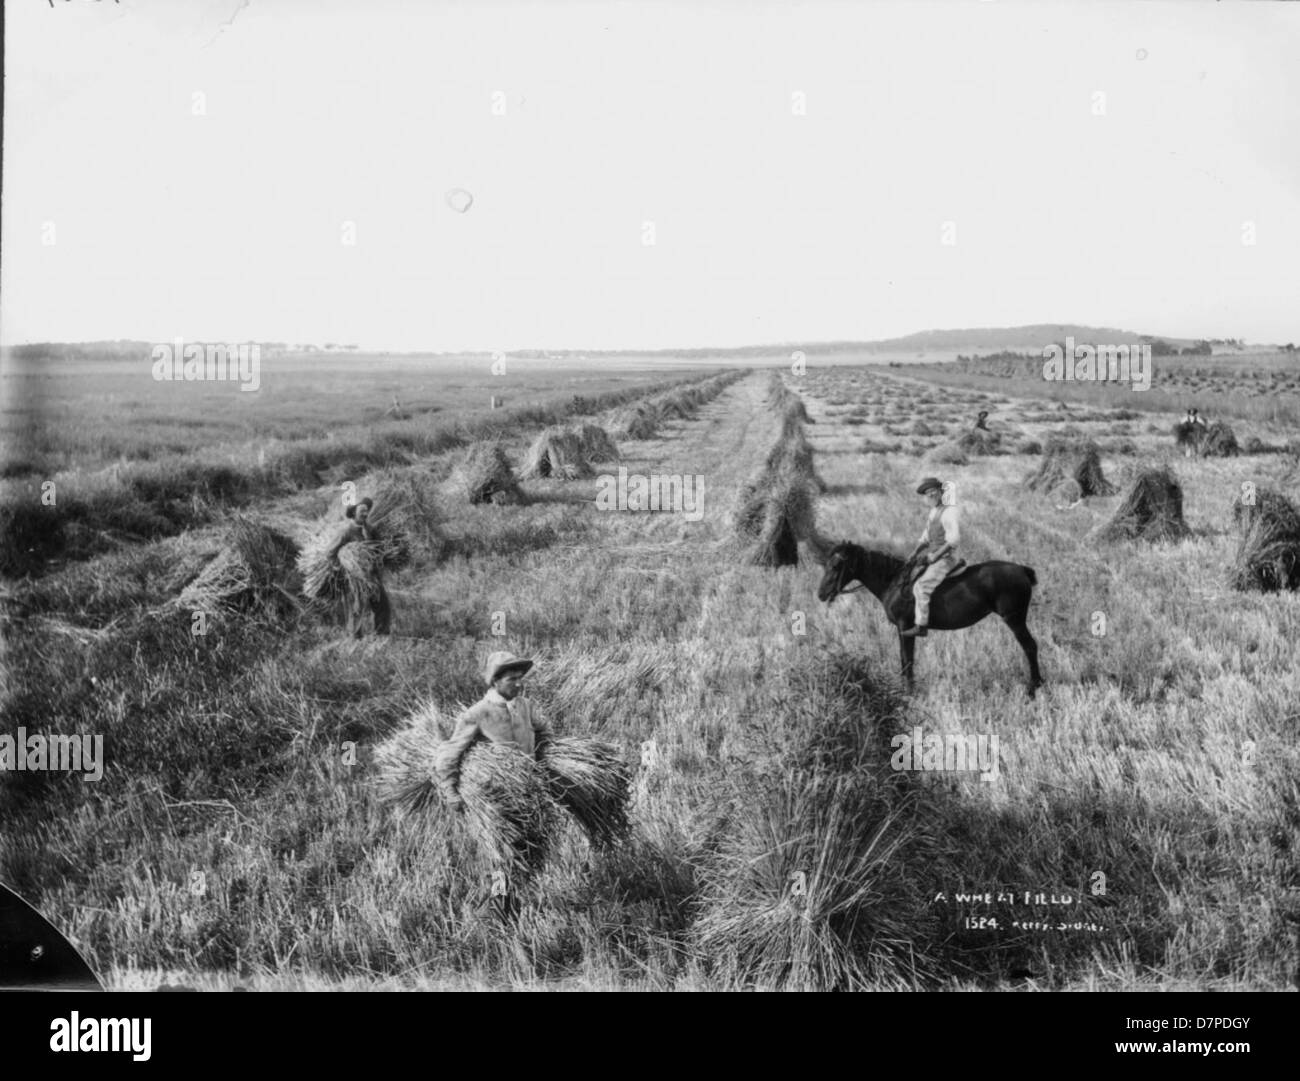 A wheat field - Stock Image